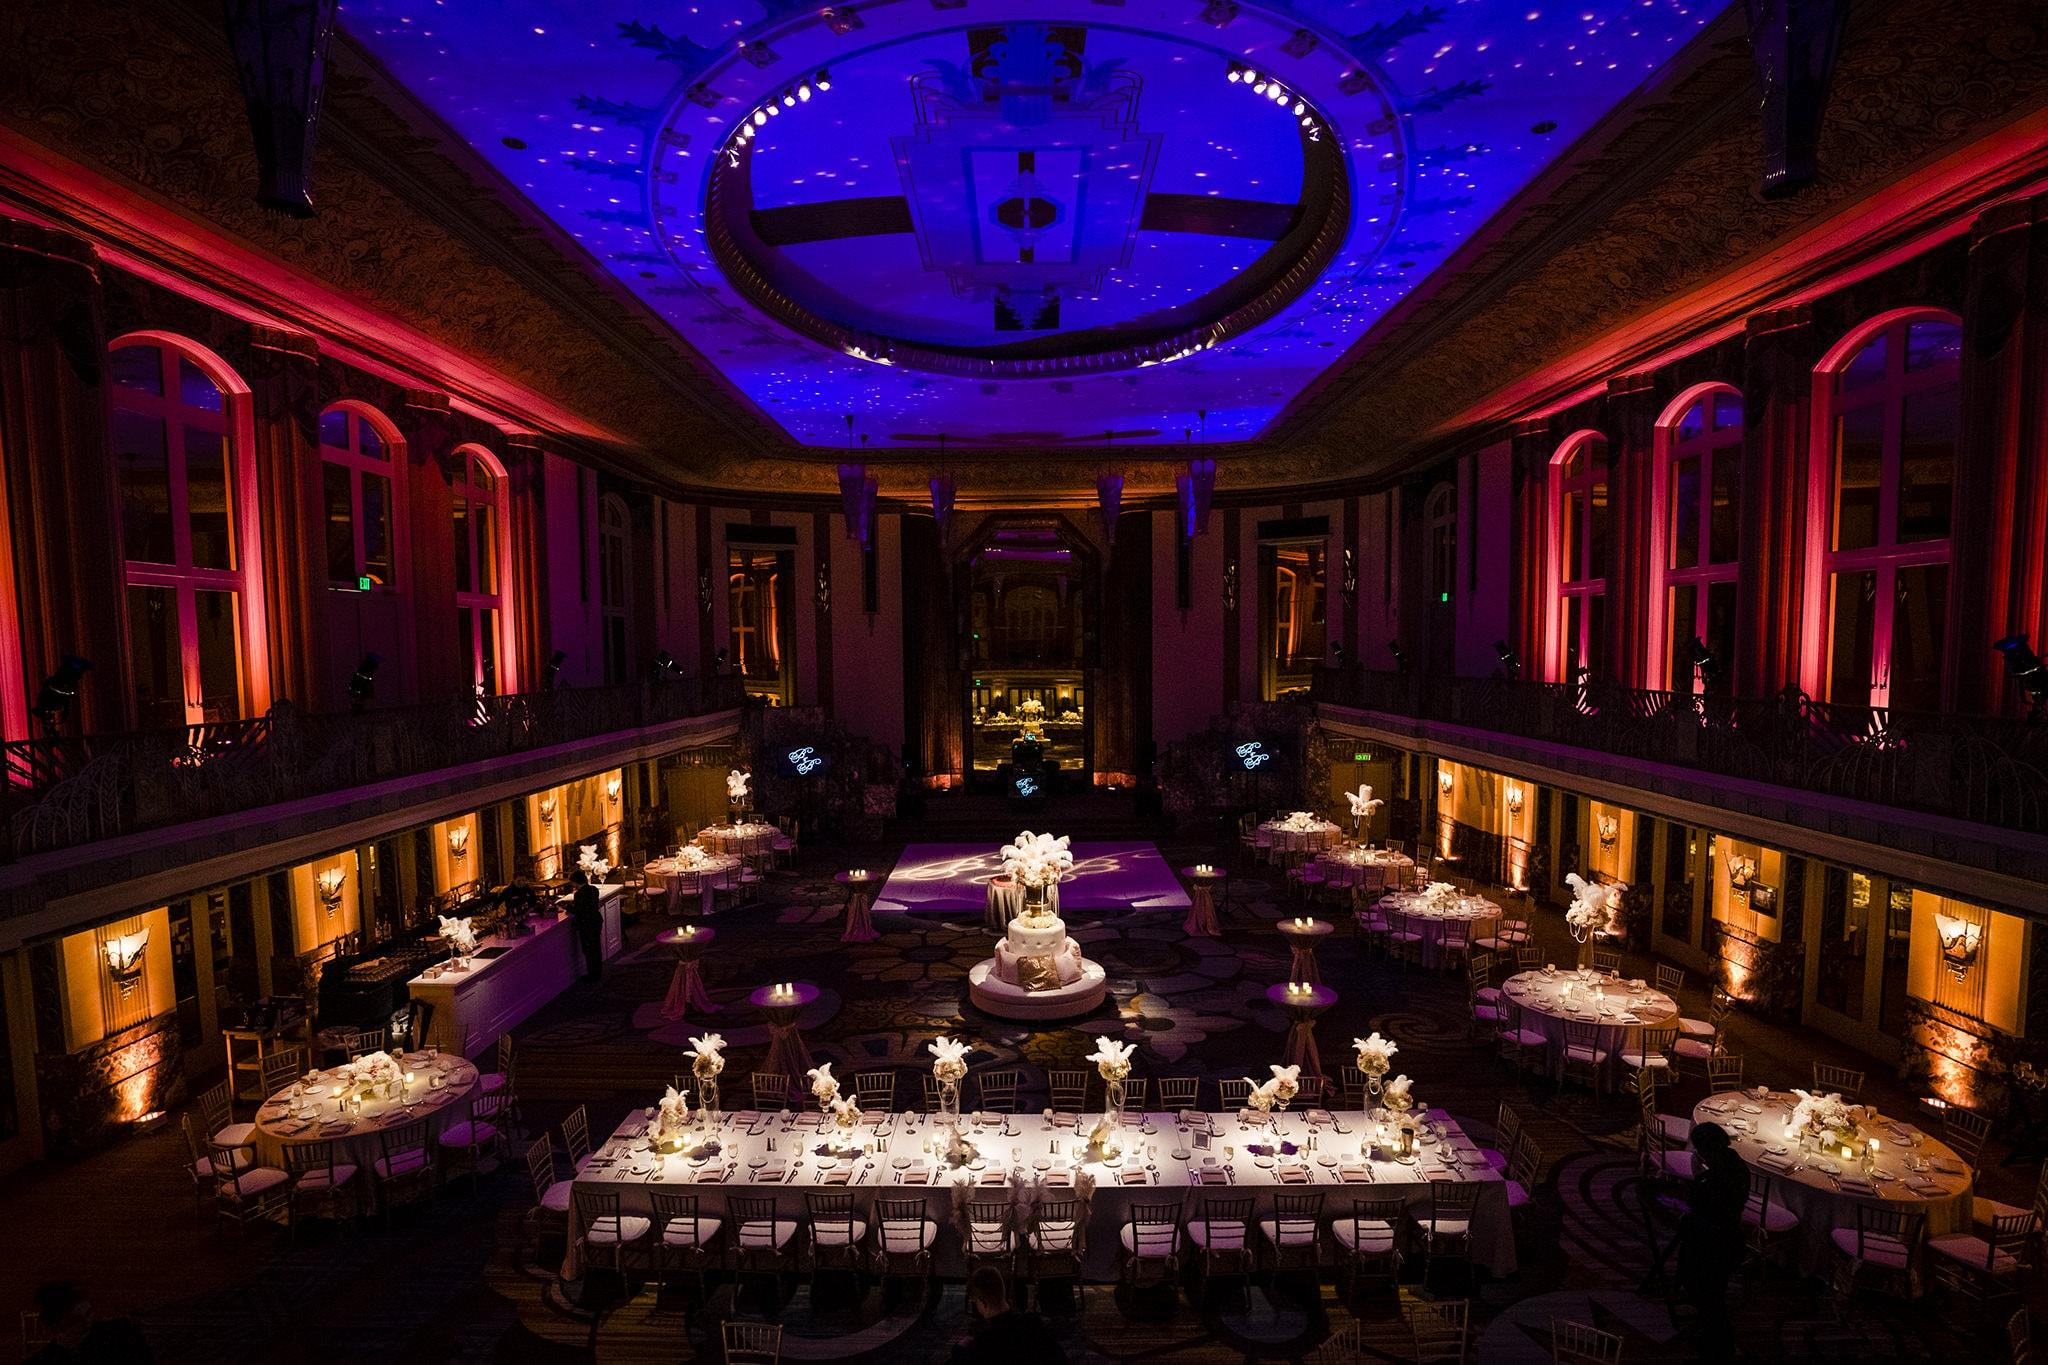 Wedding reception hall of mirrors in Cincinnati